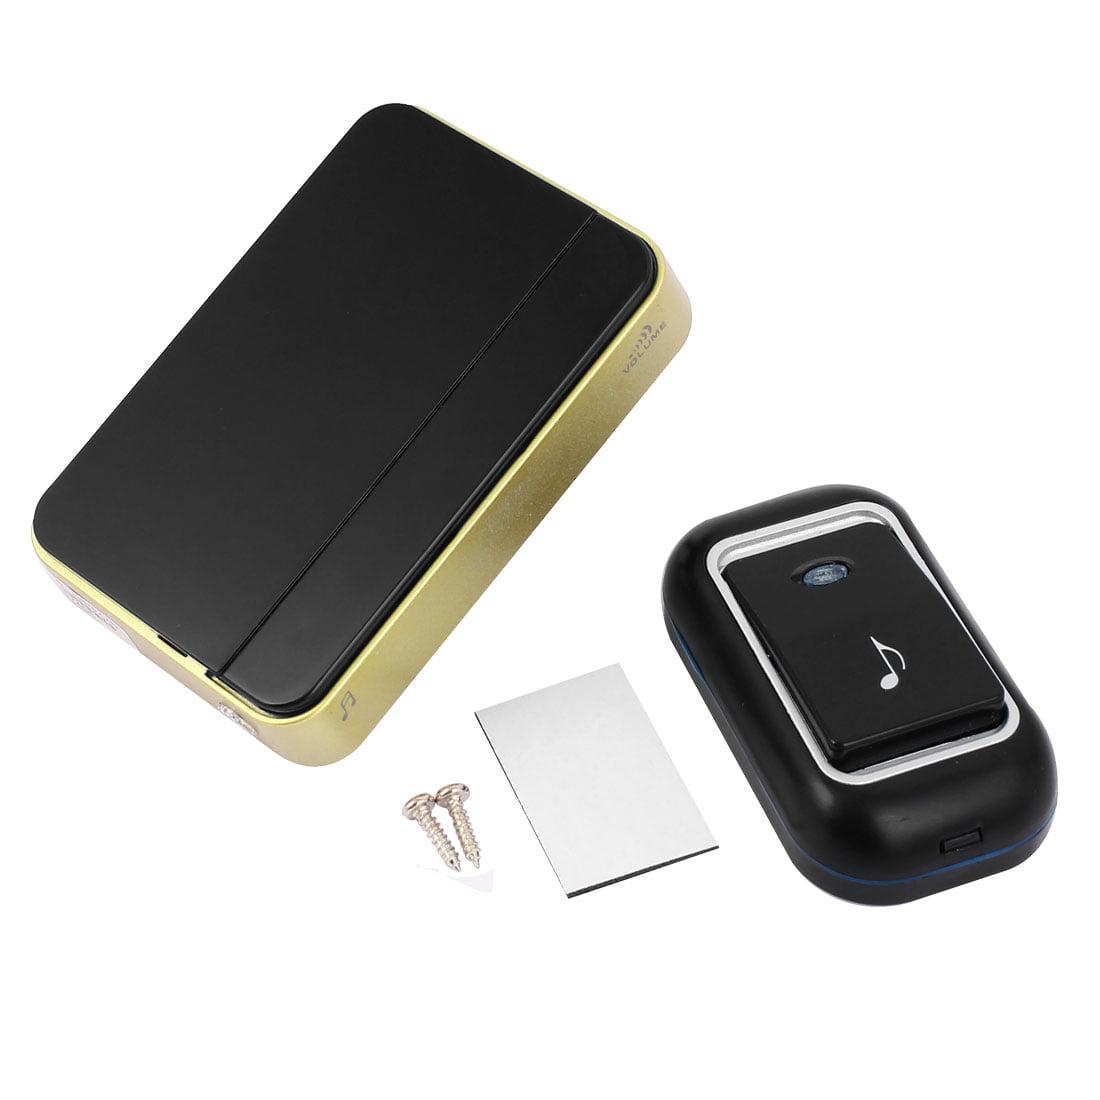 US Plug AC110-220V 36 Chimes  Cordless Bell RC Doorbell Black